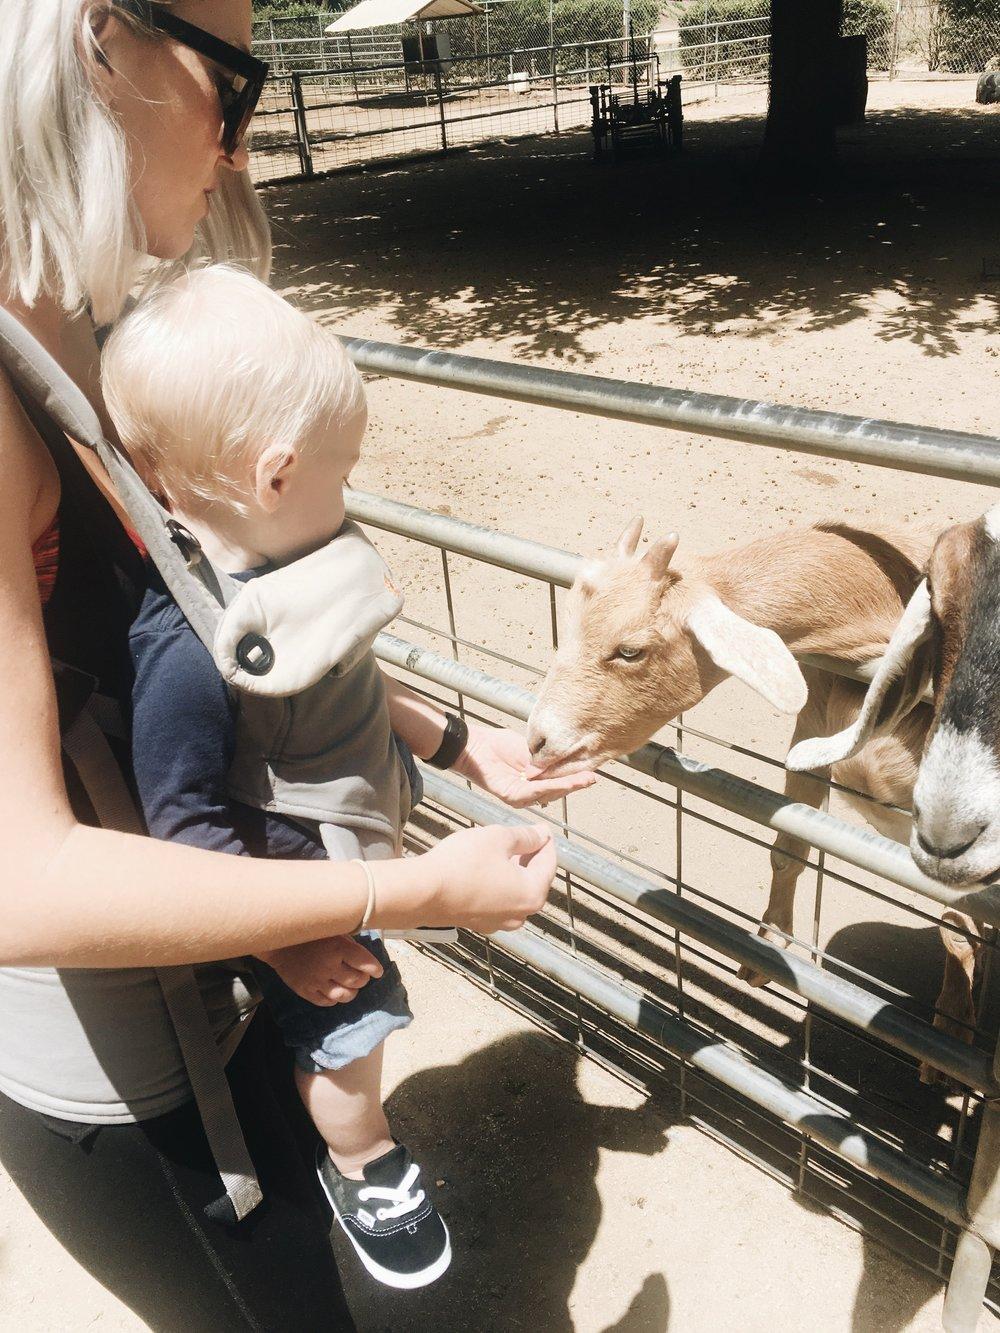 Feeding goats at Bates Nut Farm